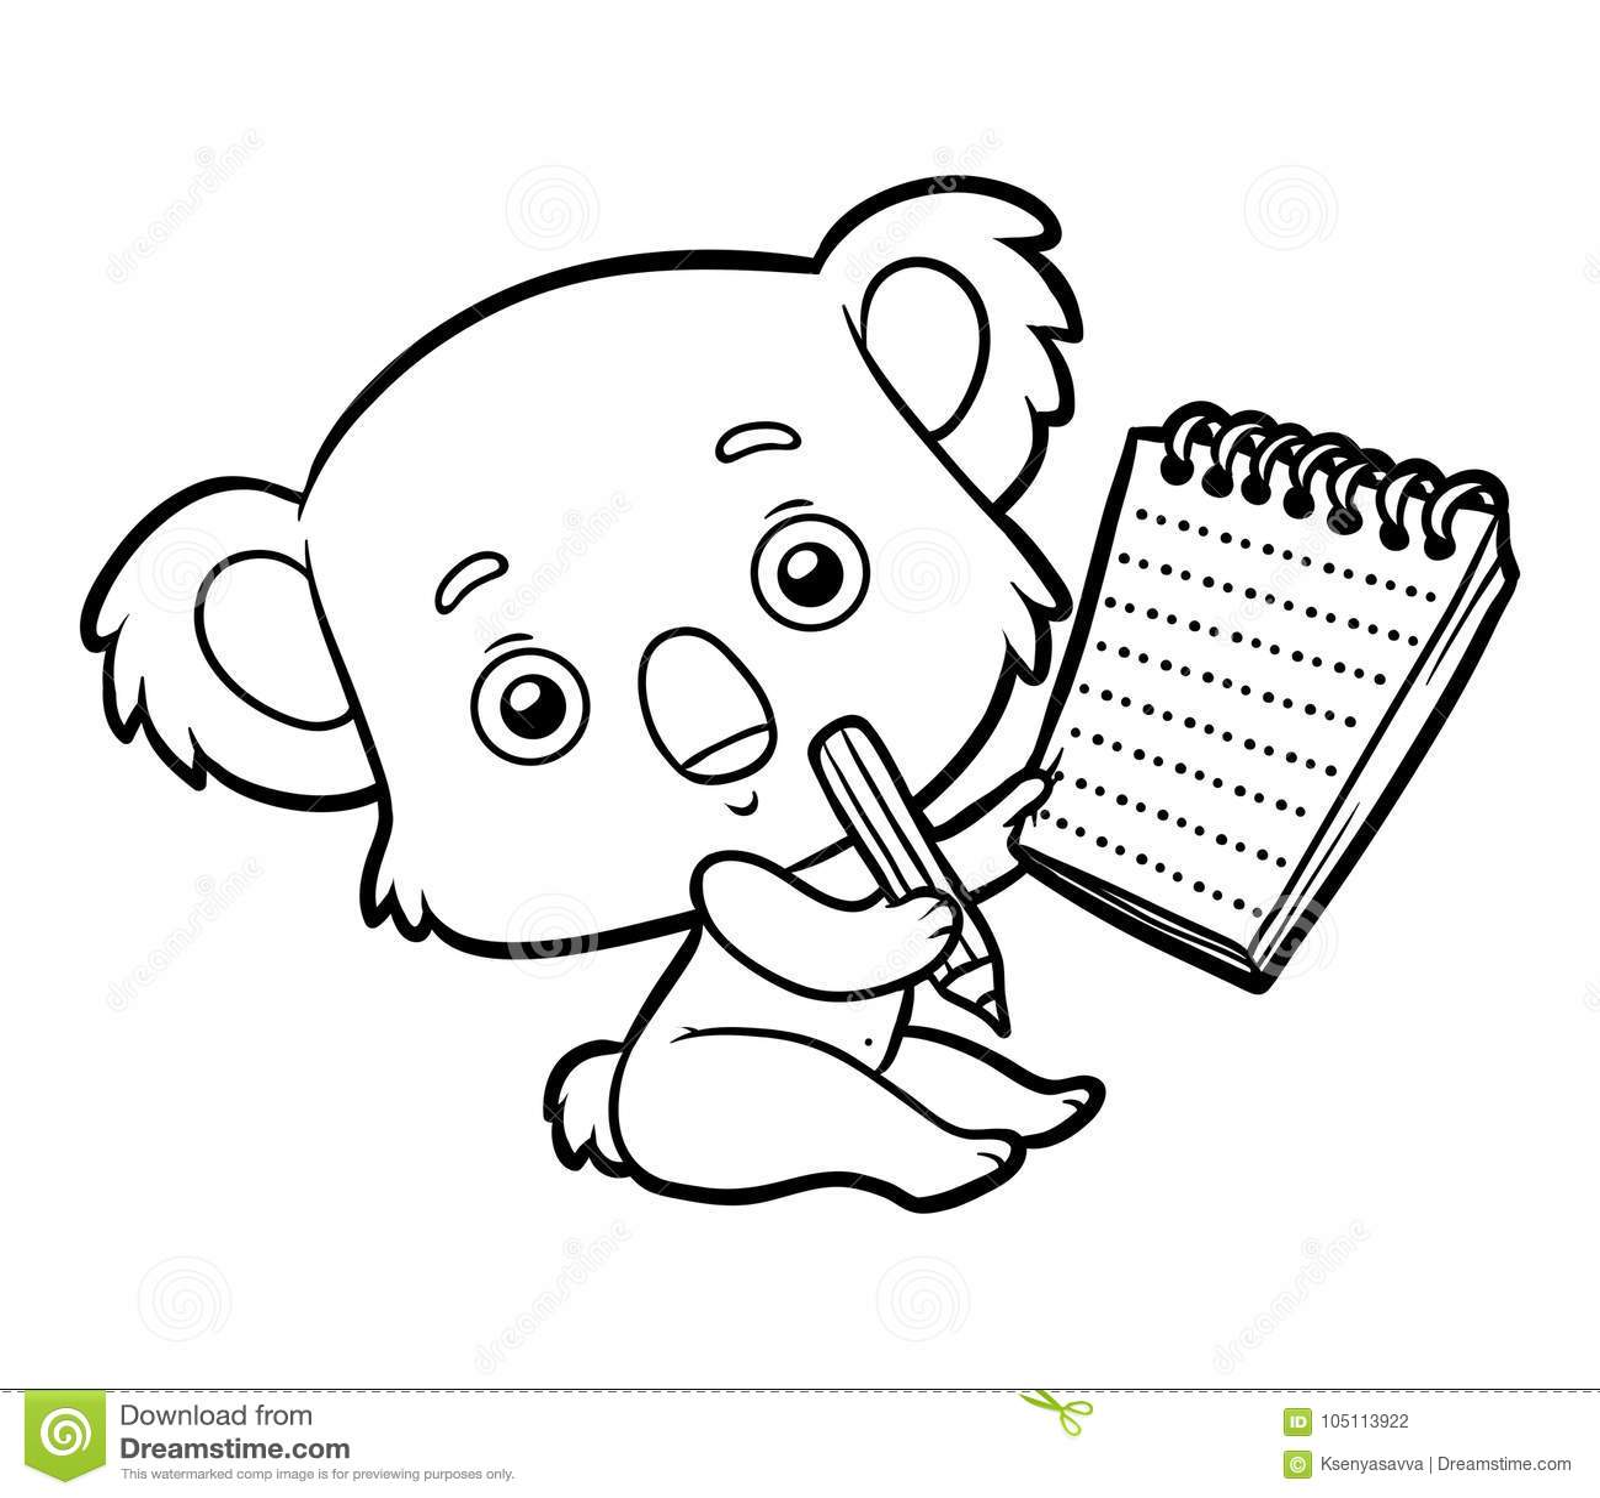 Coloring book, Koala stock vector. Illustration of outline ...